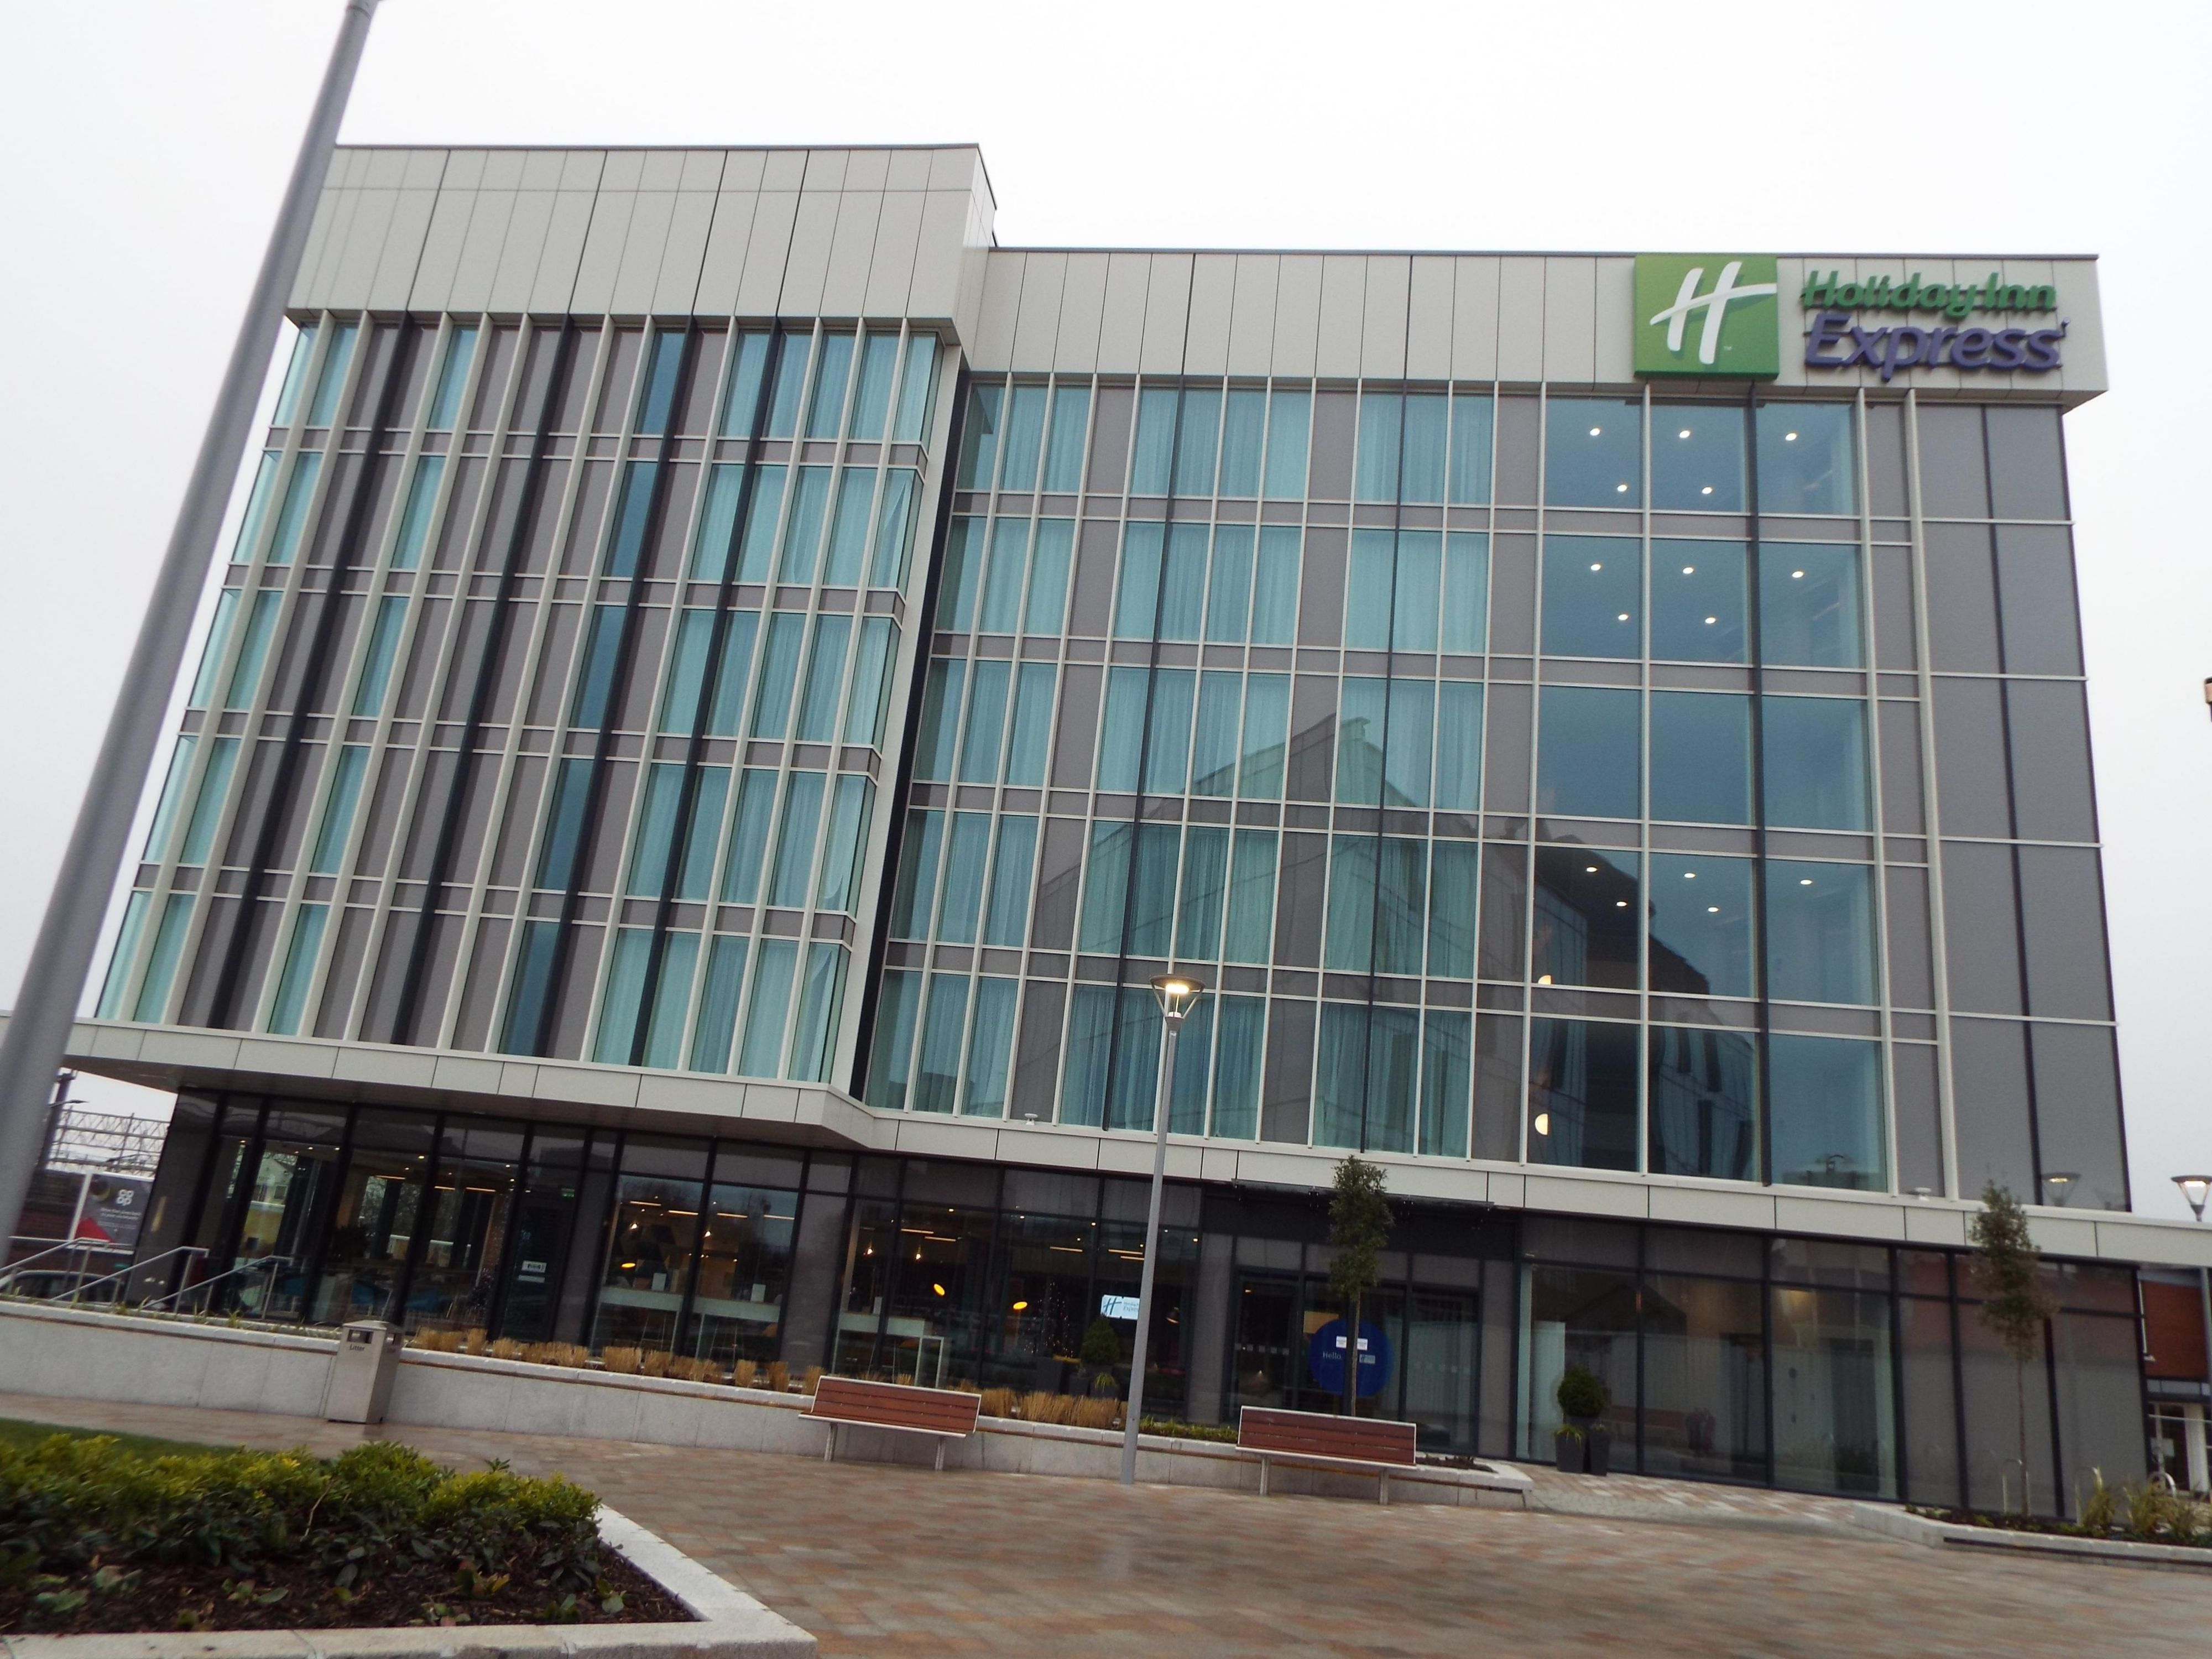 Hotels Near Stockport